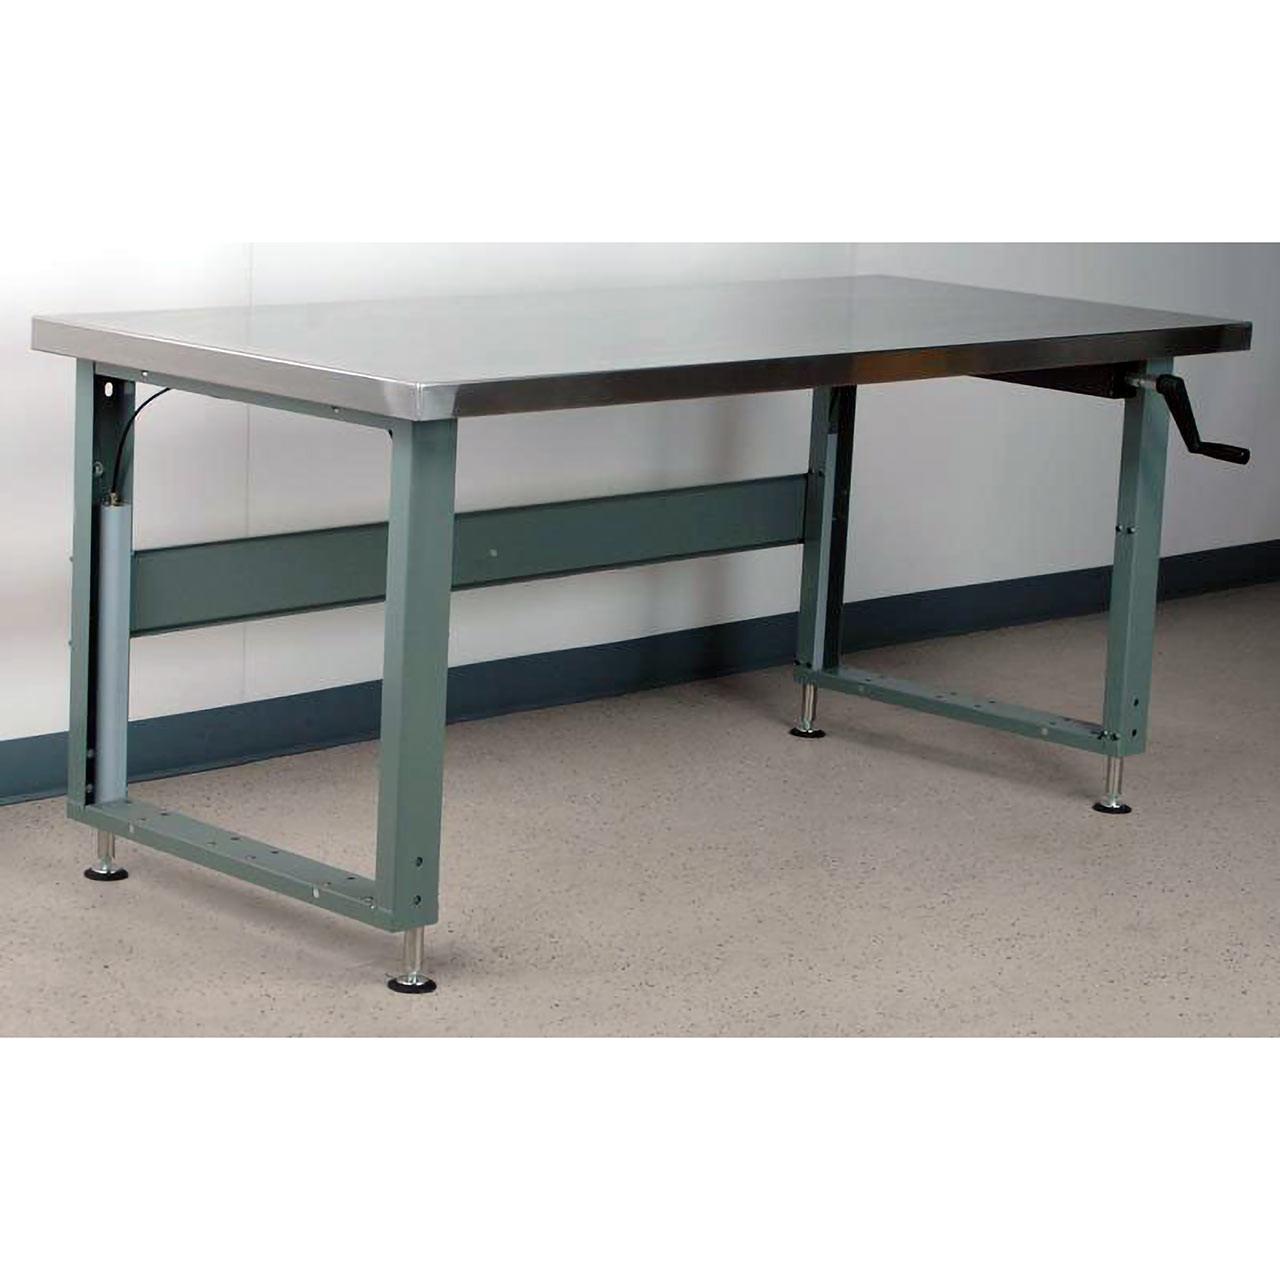 Hand-Crank Adjustable Height Workbenche Stainless Steel Top